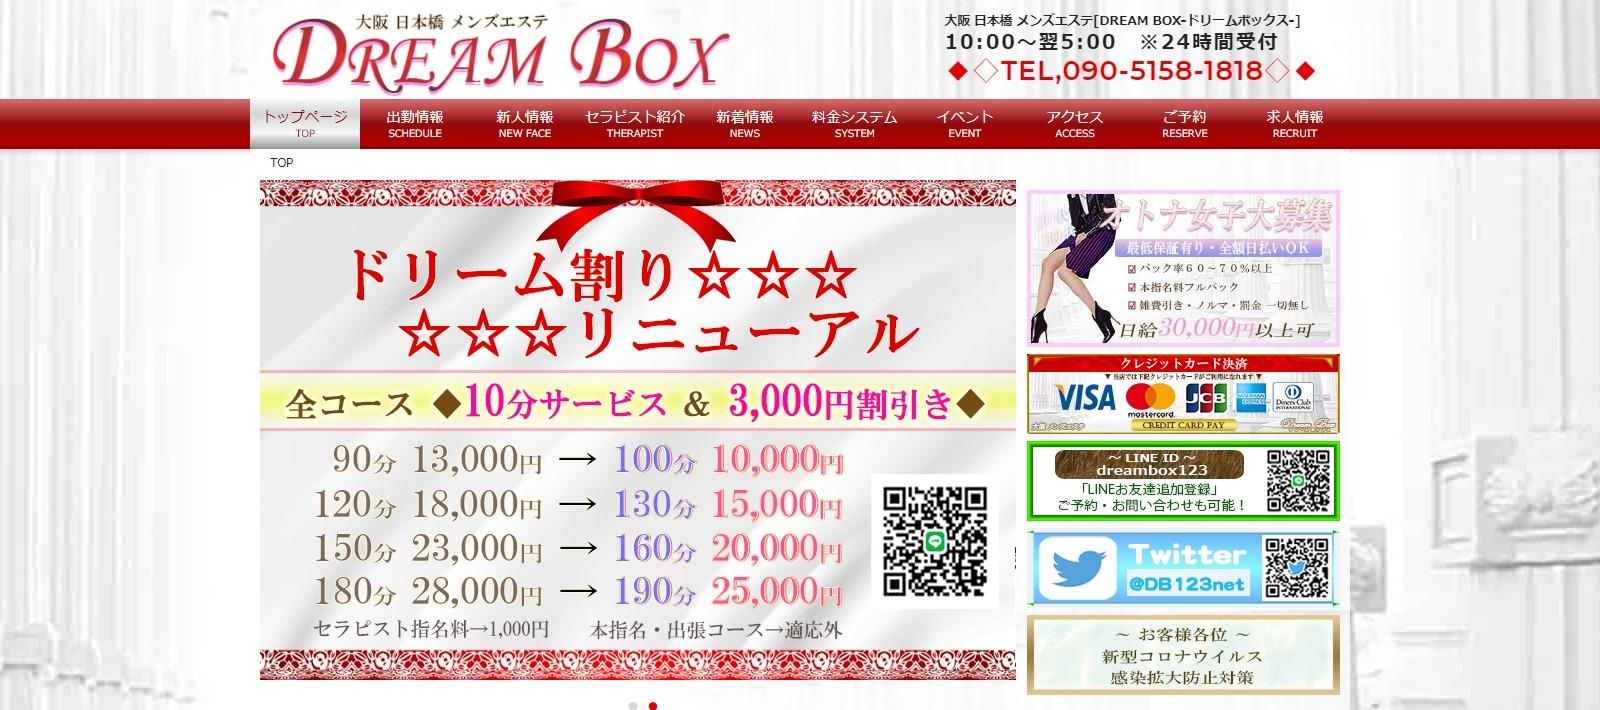 DREAM BOX (ドリームボックス)